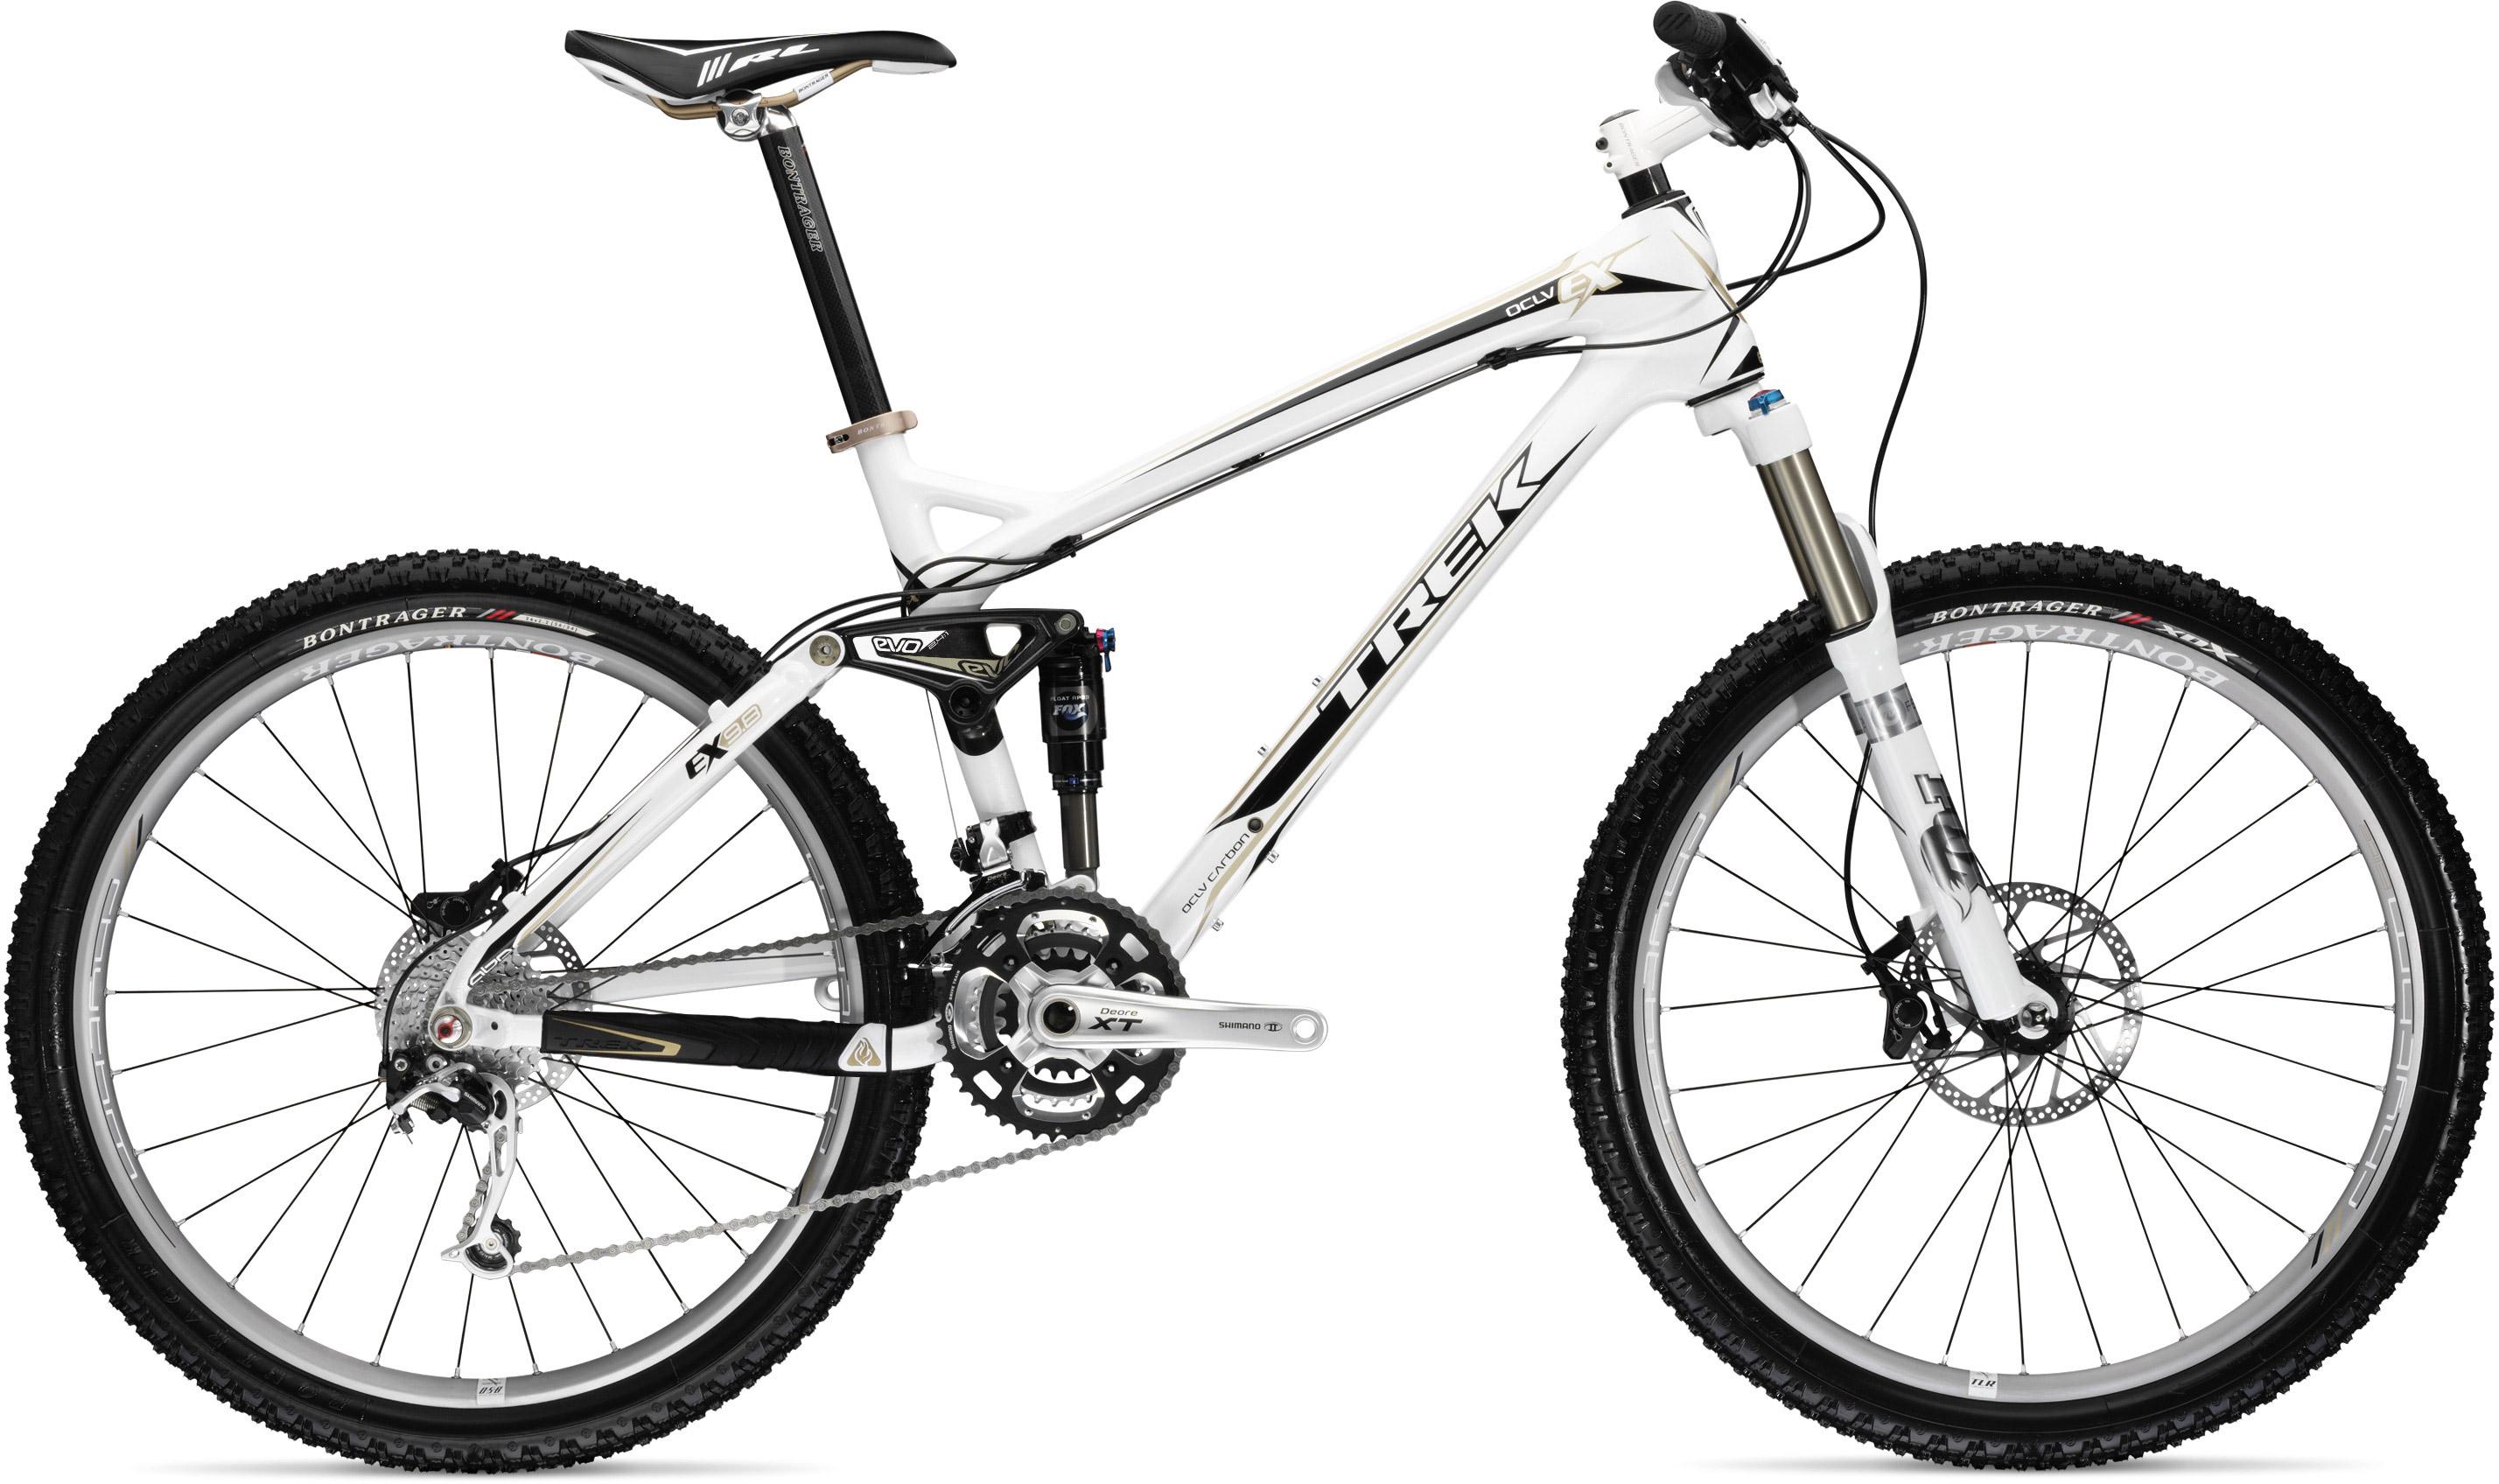 e393d6c0322 Trek Fuel EX 9.8 - All Mountain   Culture Vélo